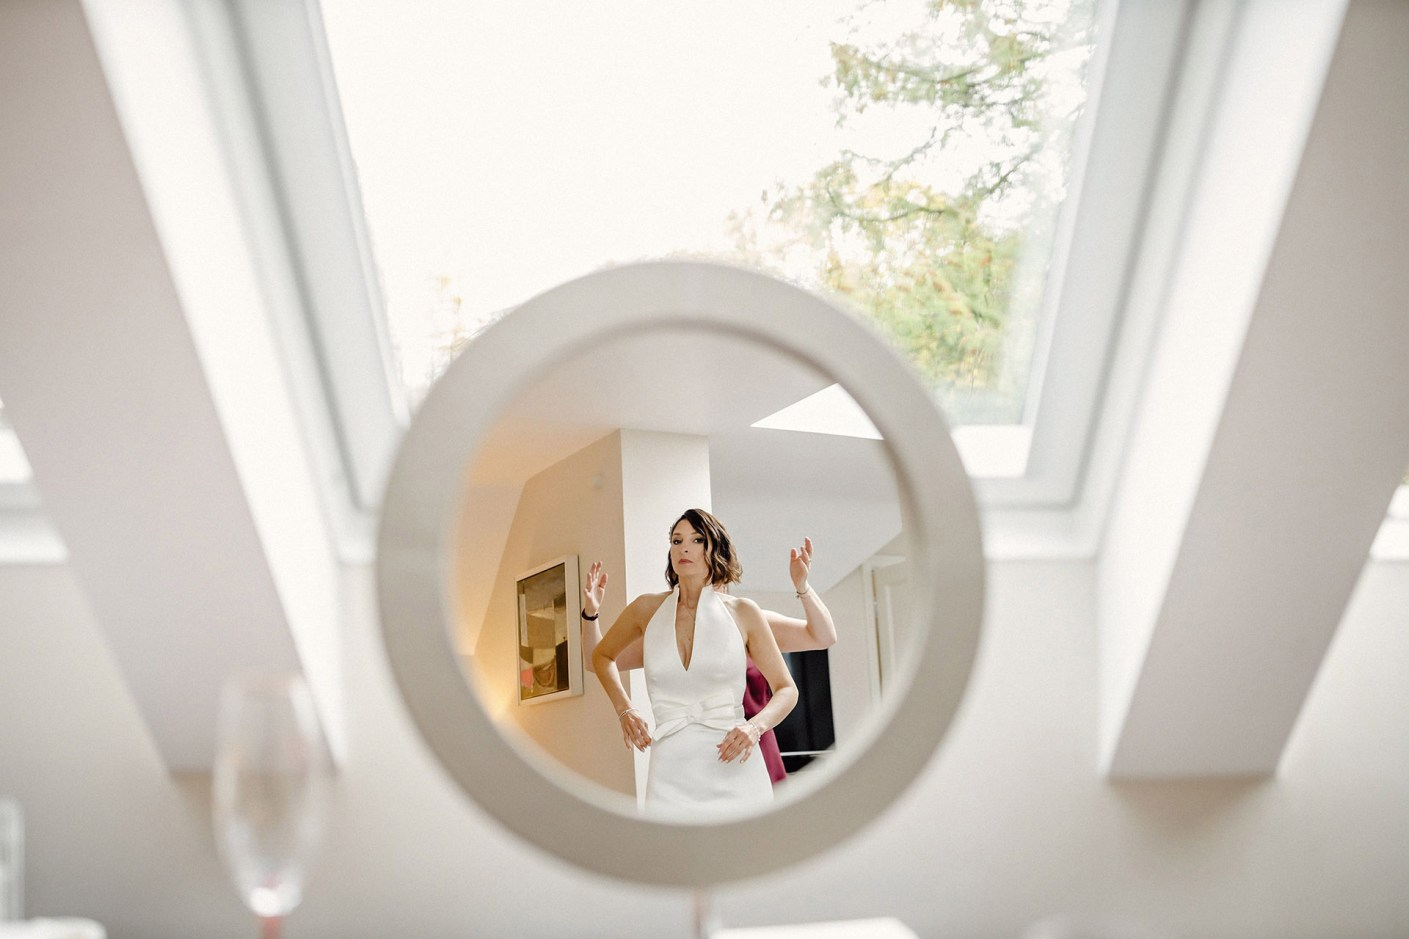 mirror reflection, wedding dress